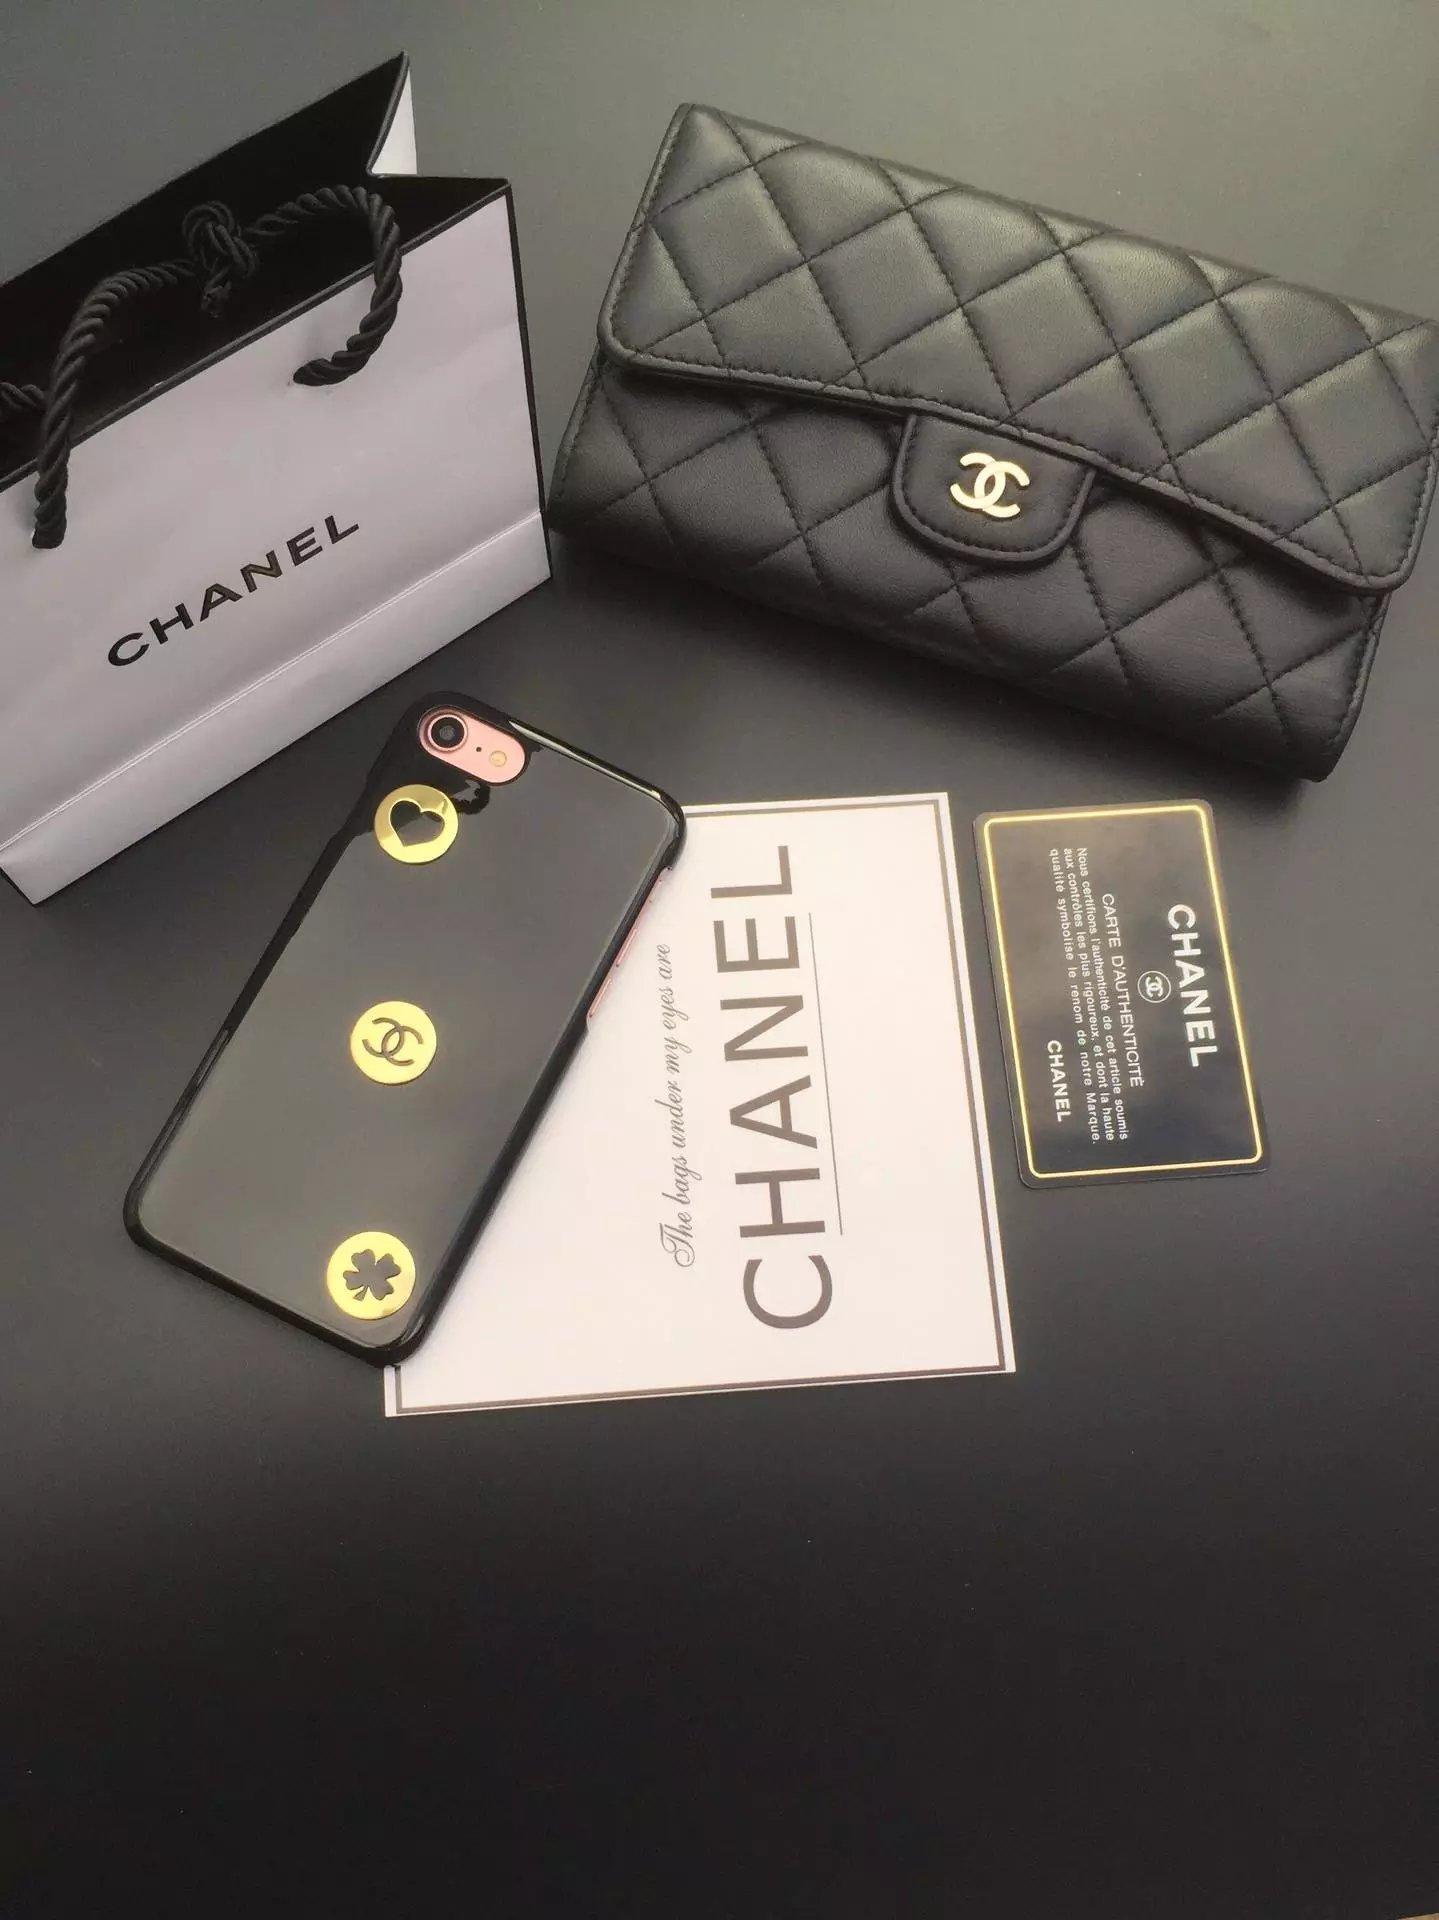 iphone hülle kaufen handyhülle iphone Chanel iphone 8 Plus hüllen hüllen 8 Pluslbst gestalten iphone 8 Plus iphone 8 Plus porthülle hülle iphone 8 Pluslbst gestalten smartphone schutzhülle 8 Pluslbst gestalten smartphone hülle mit foto ipod schutzhülle